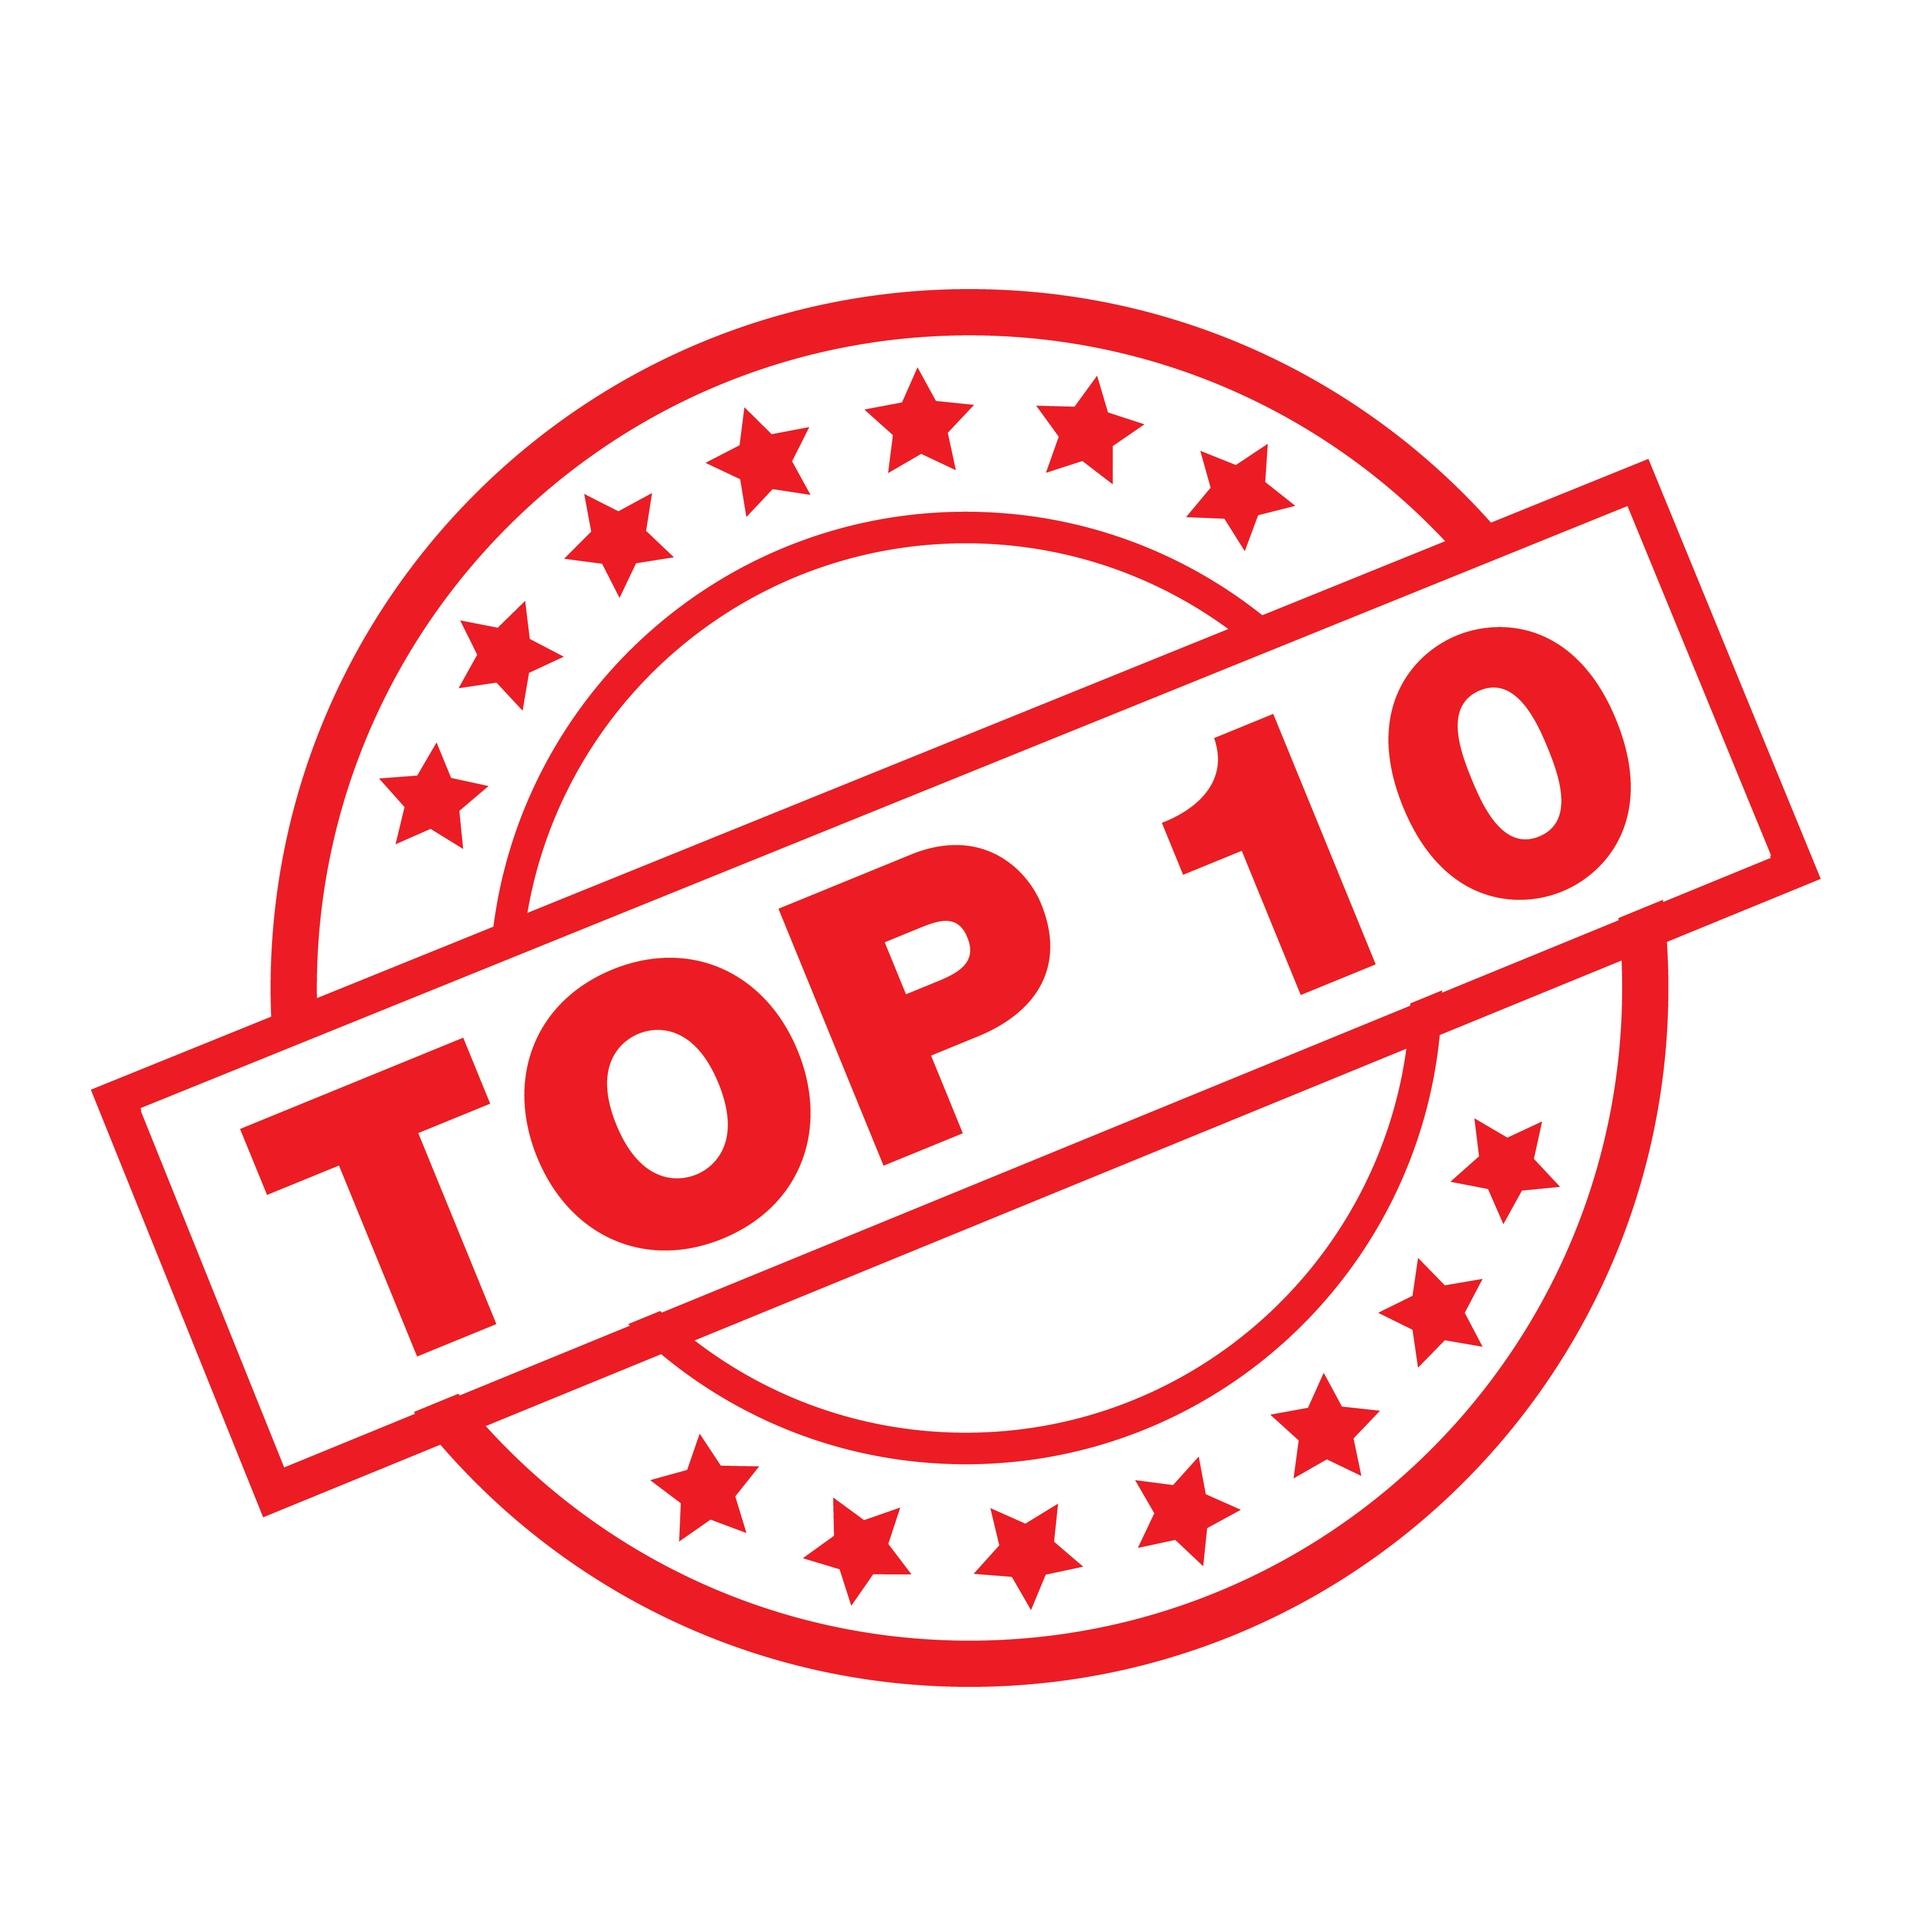 10 Tips to get a job